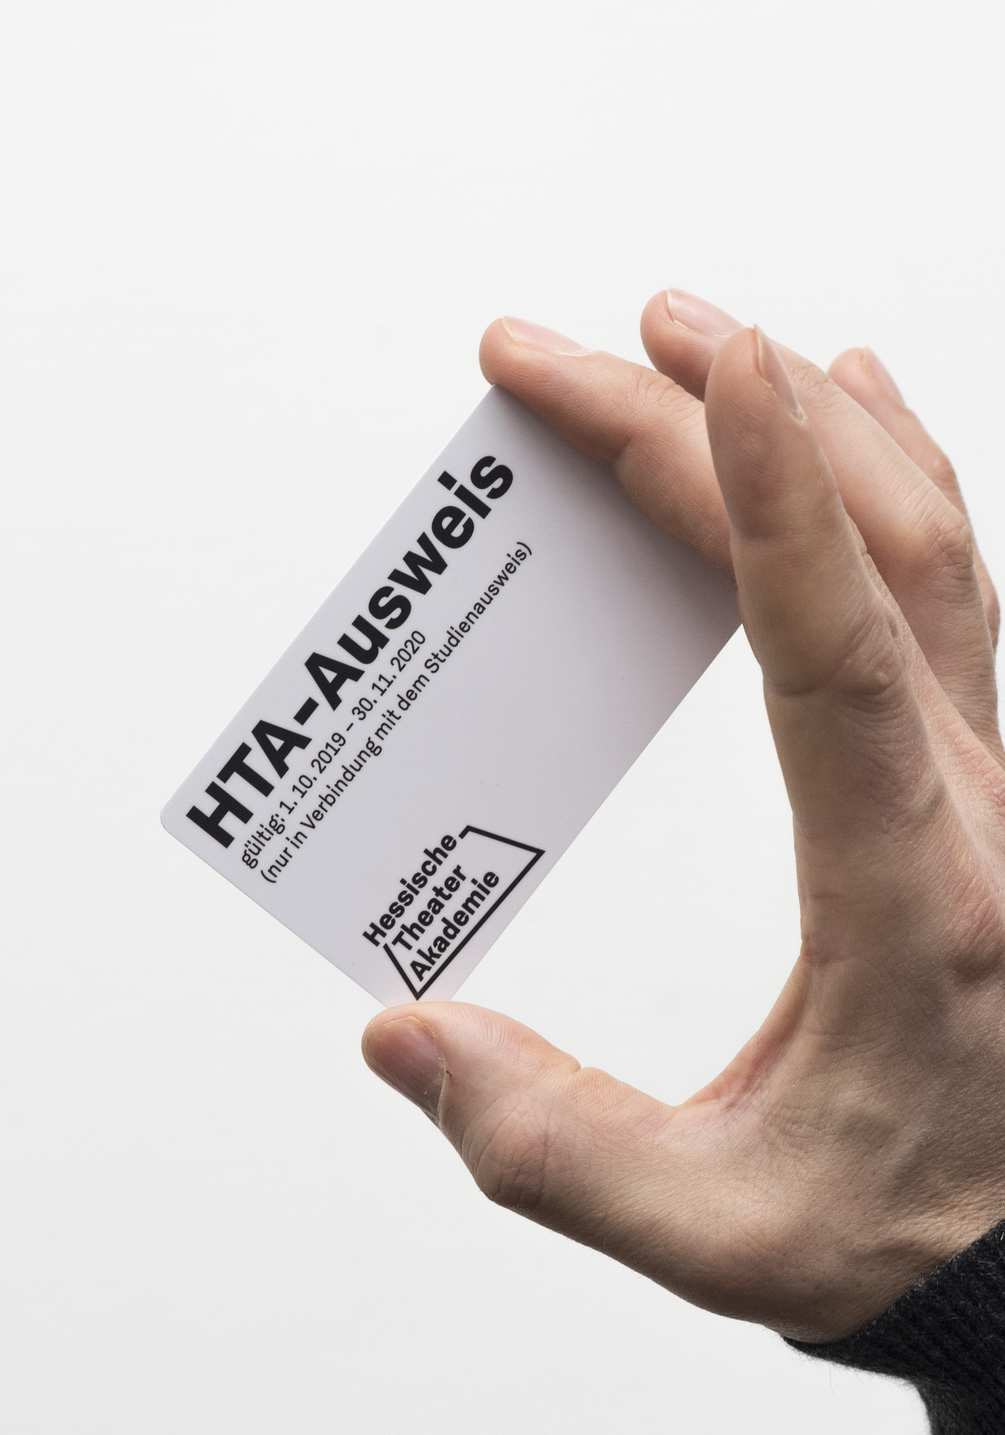 hta-badge-6-1005x1435px